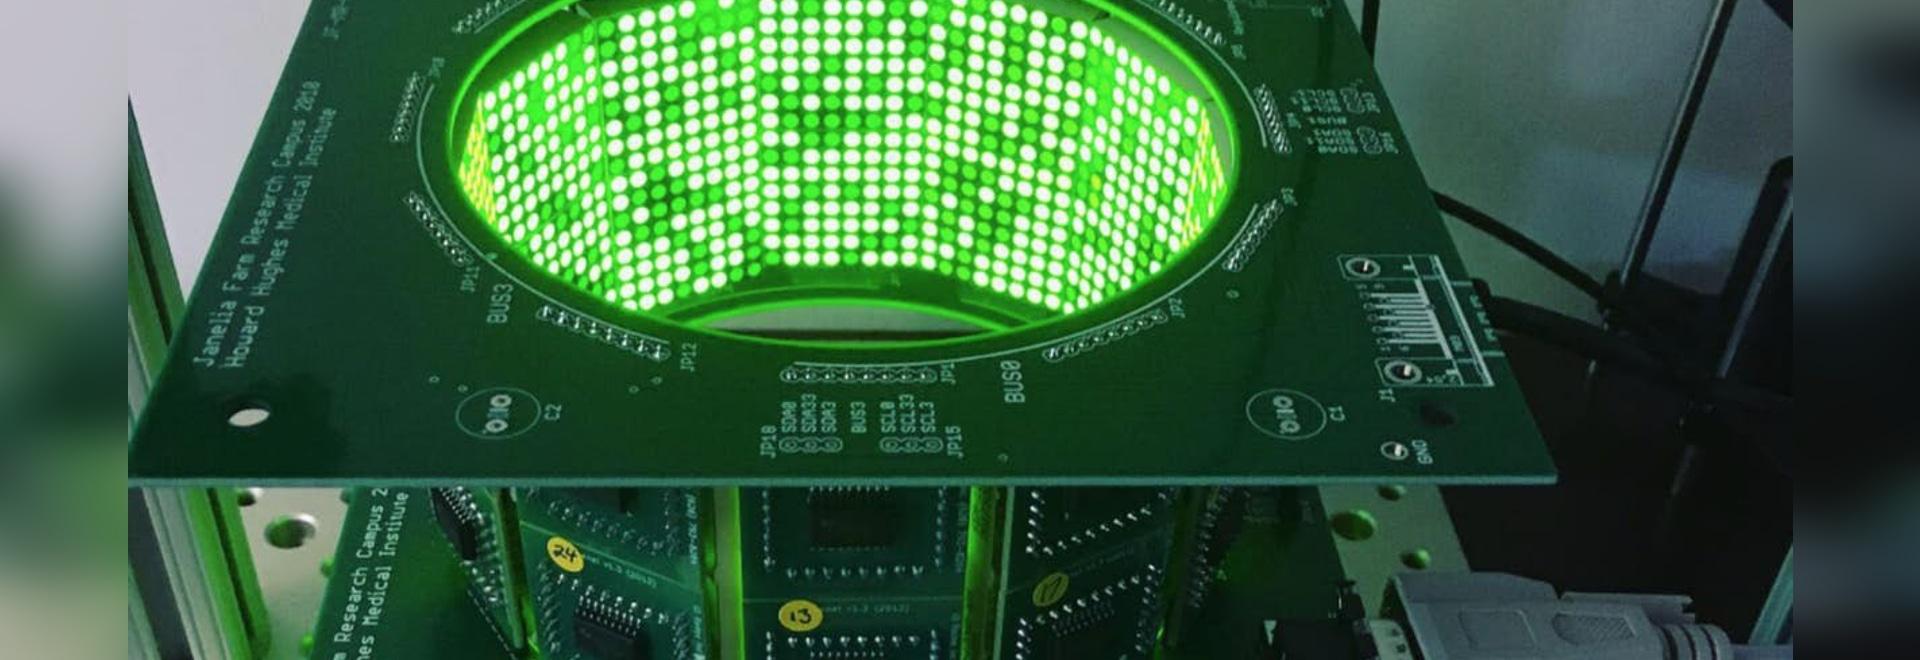 LED mosquito flight simulator.